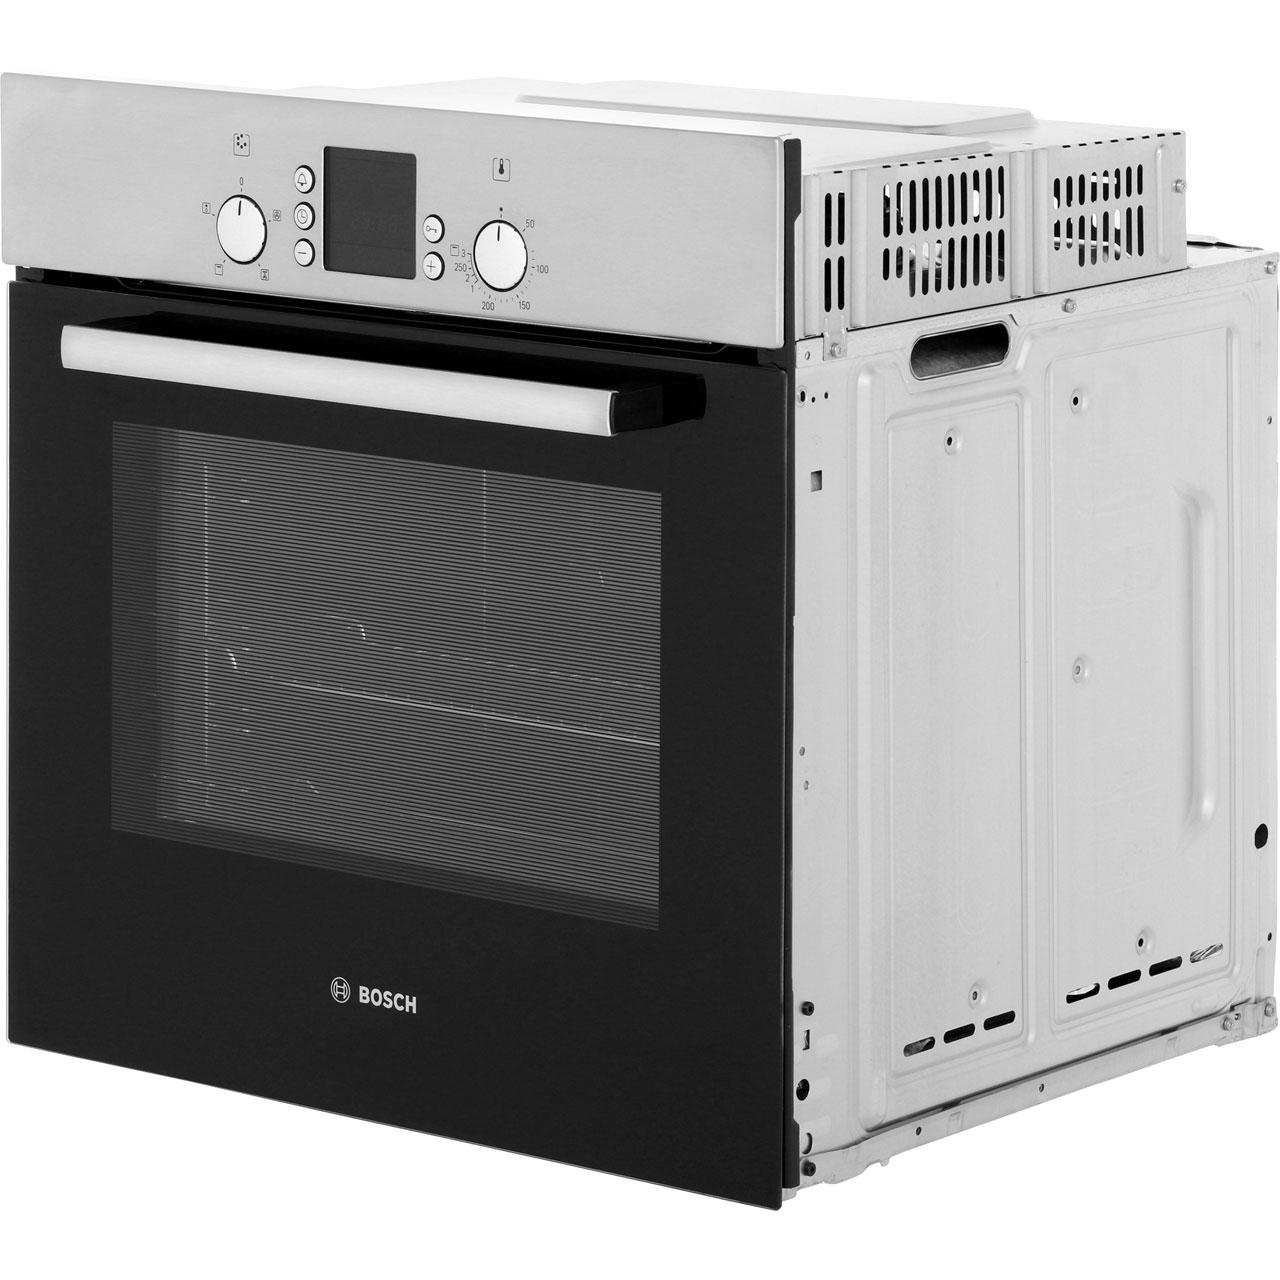 Boots kitchen appliances washing machines fridges more for Bosch backofen